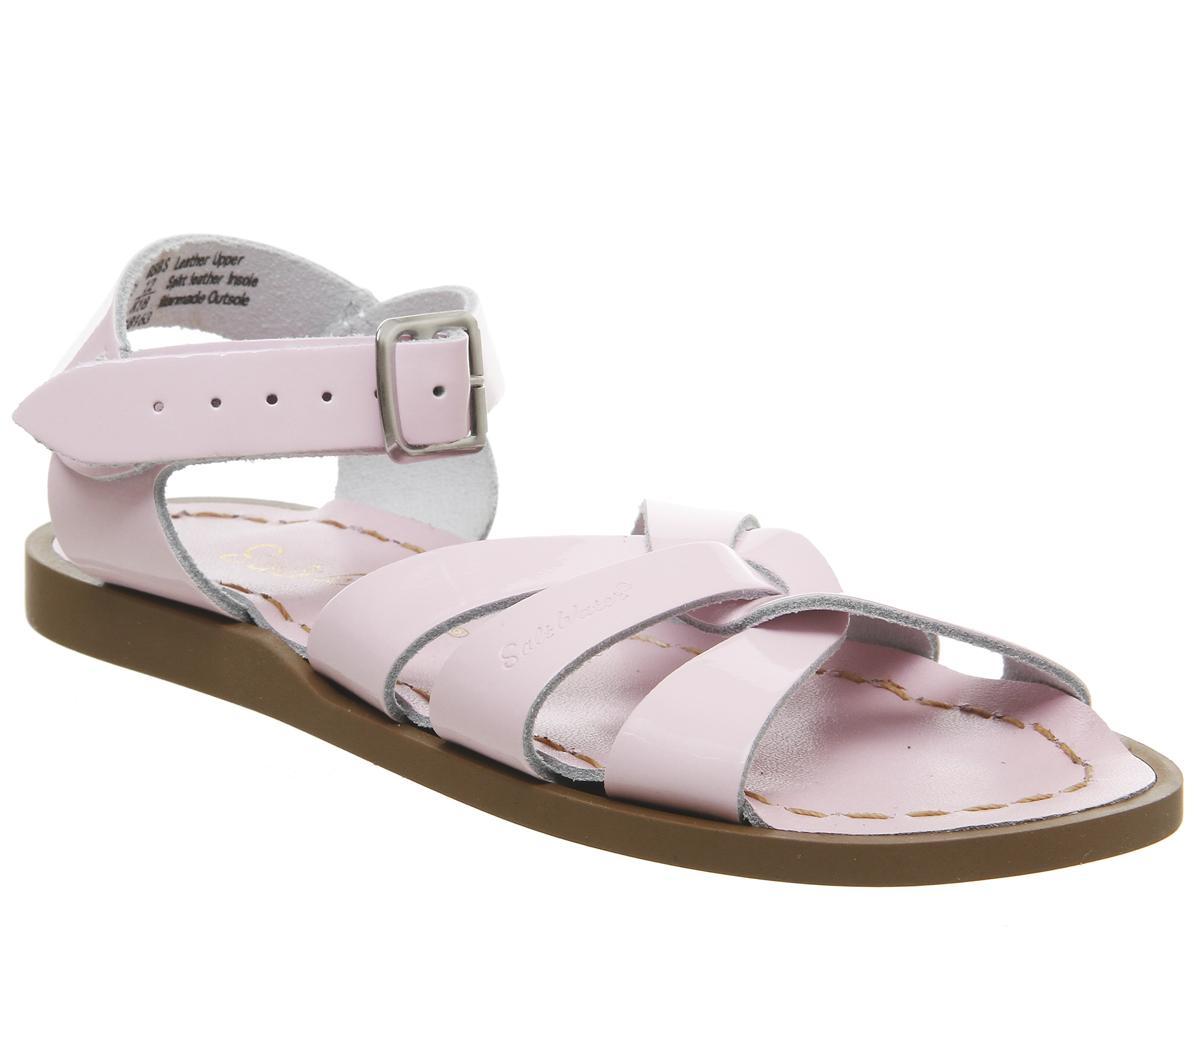 Saltwater Original 9-12 Sandals